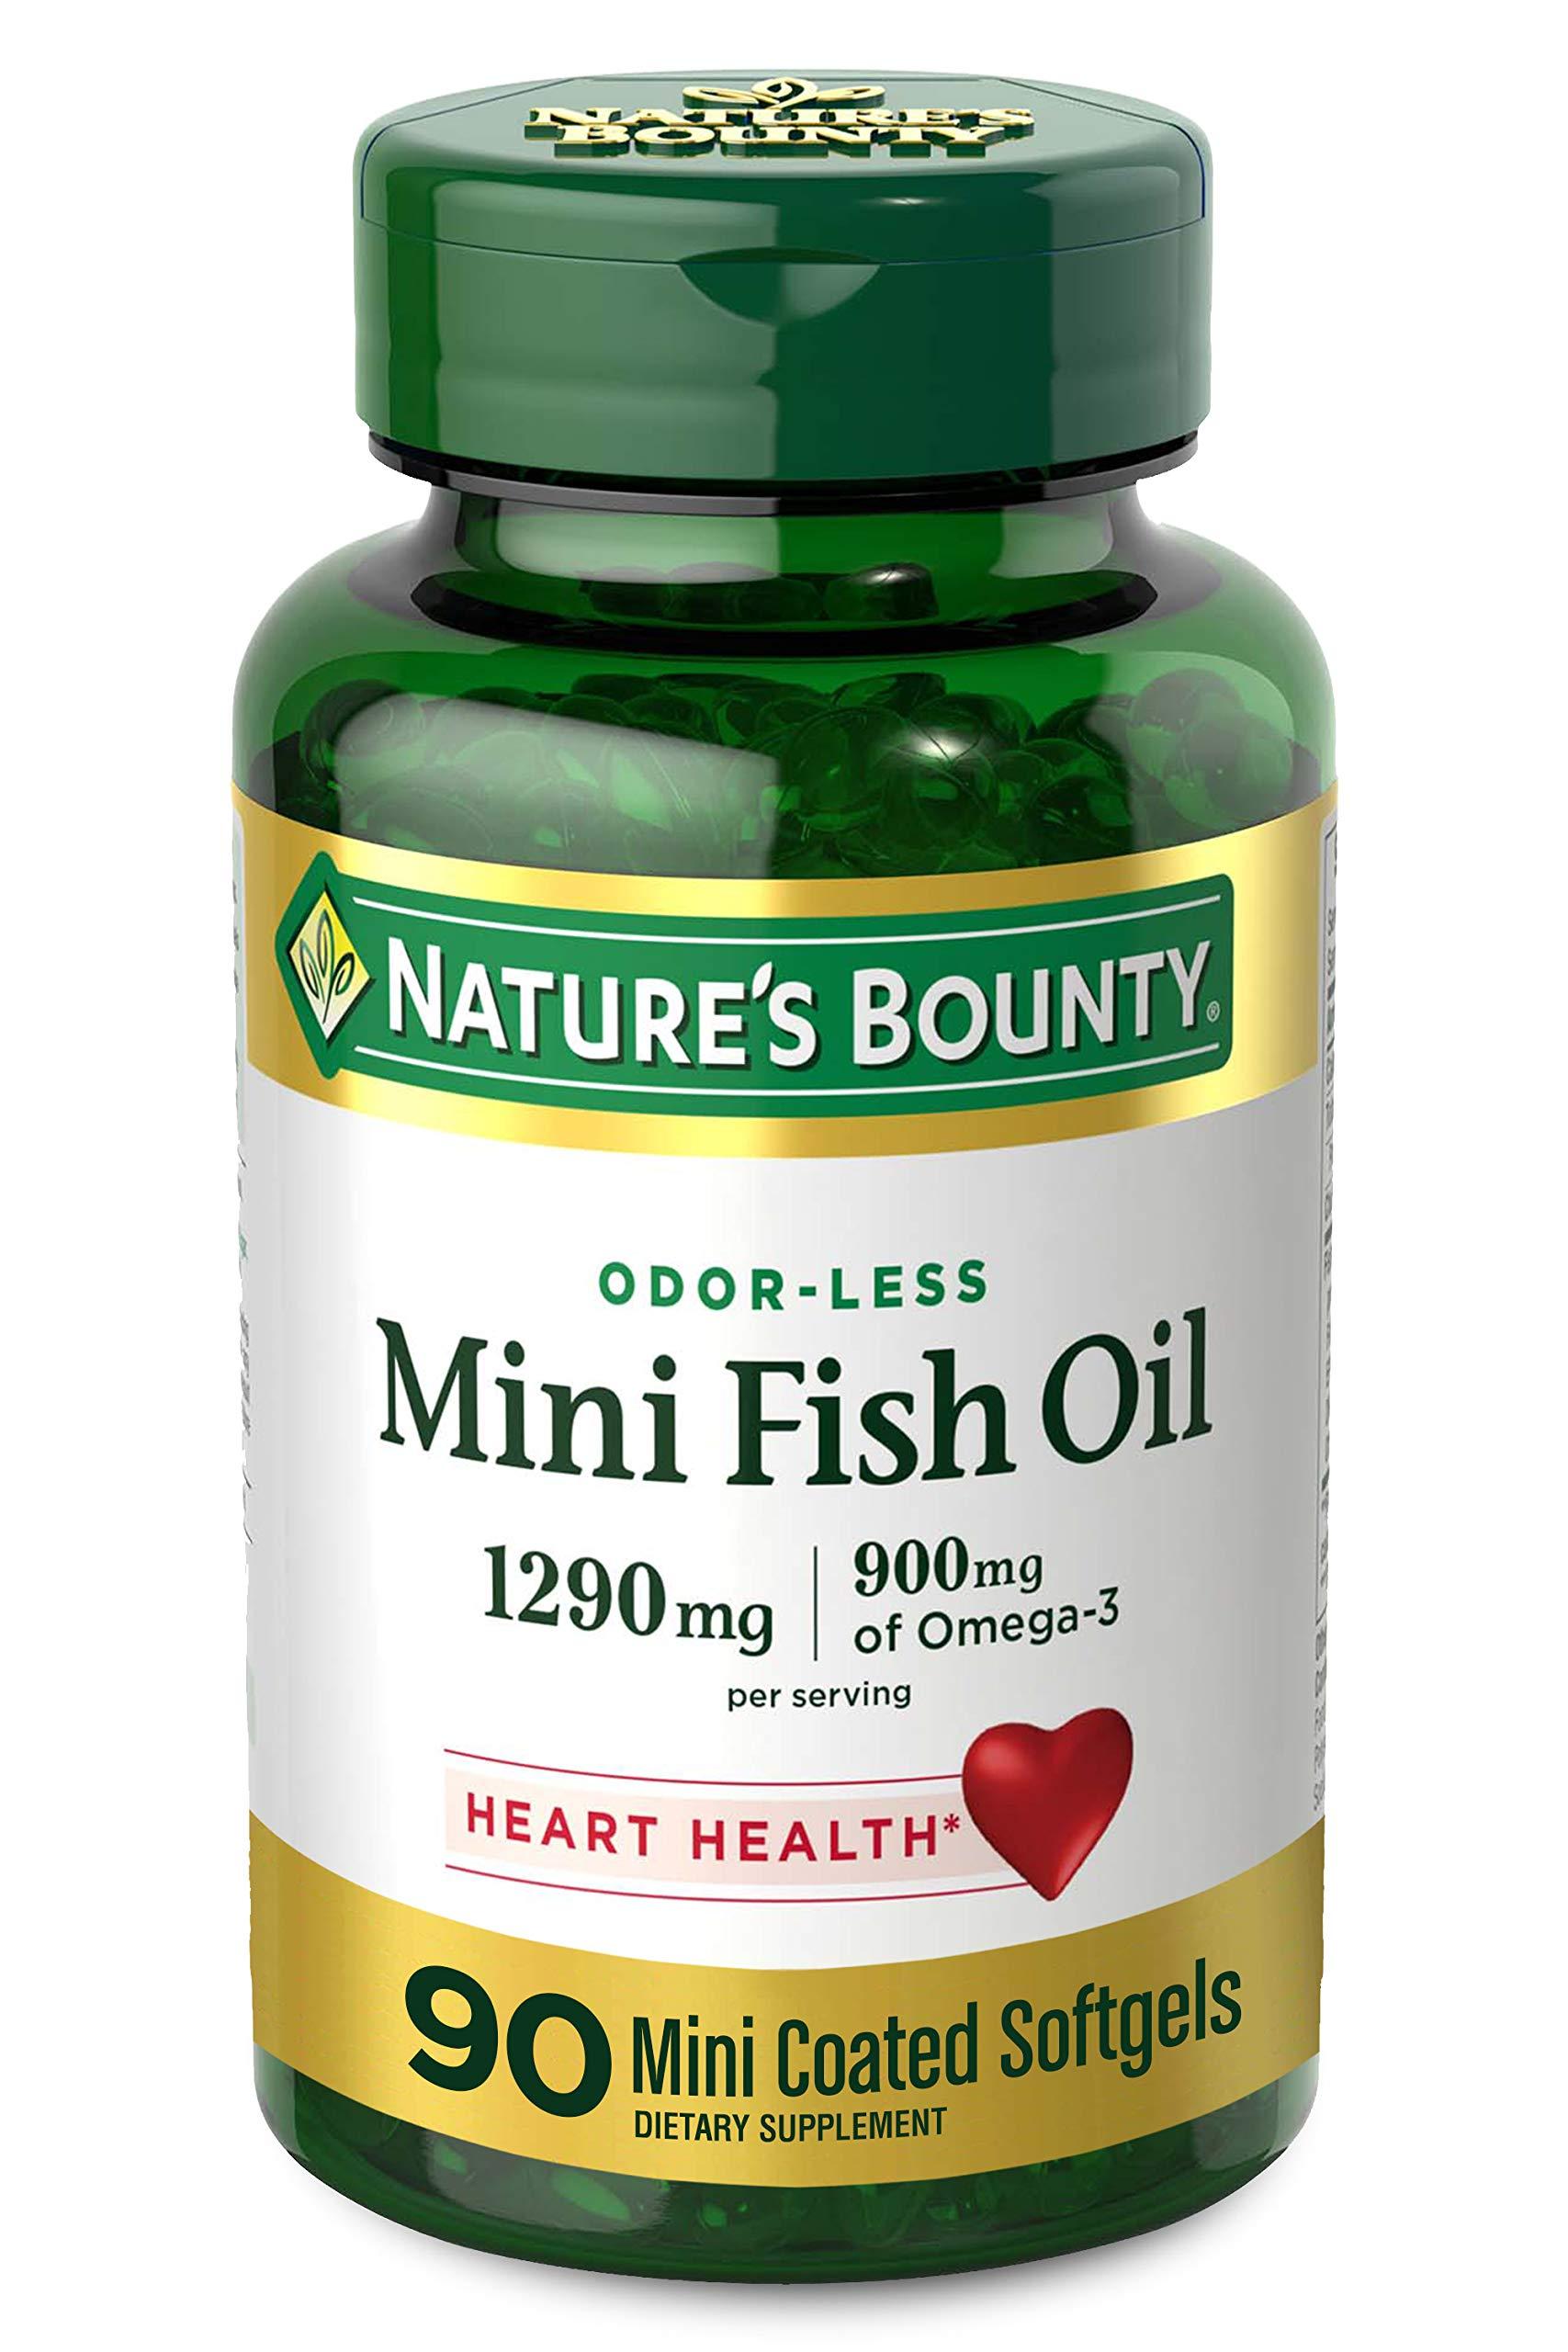 Nature's Bounty Mini Fish Oil, 1290mg, 900mg of Omega-3, 90 Mini Coated Softgels